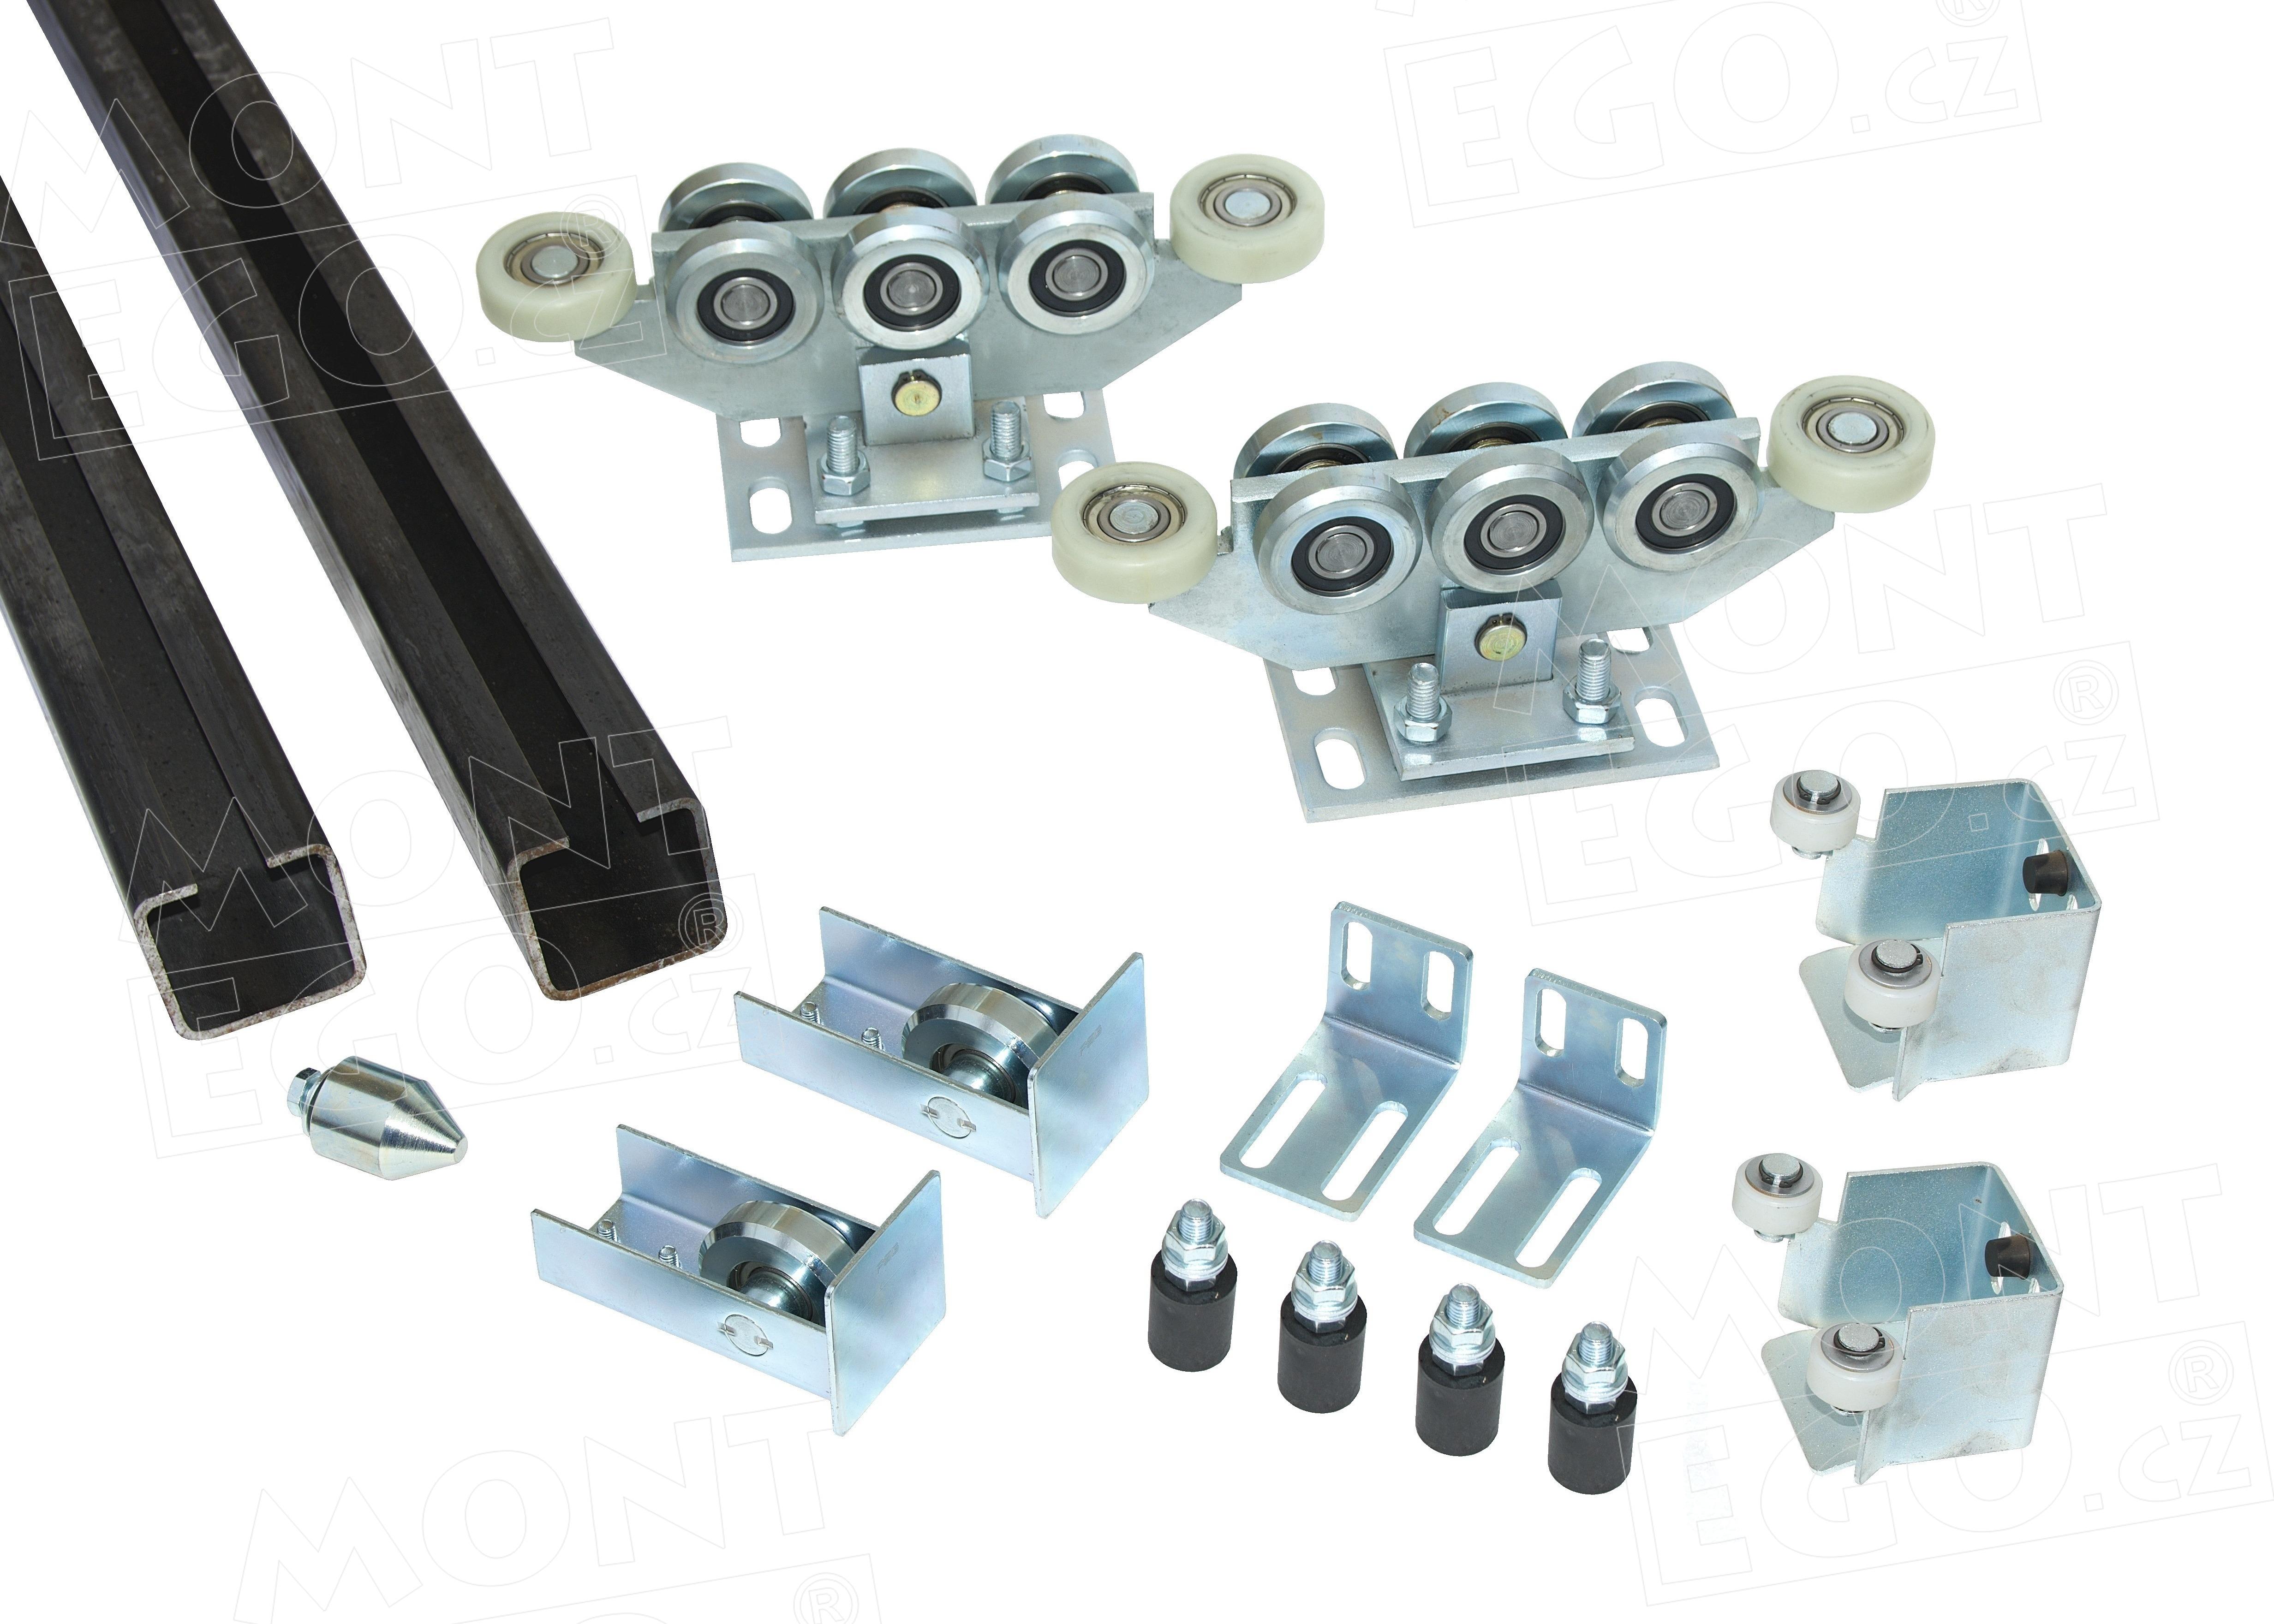 Posílený nosný komplet samonosné posuvné brány SK80.70 PLUS do 7 m